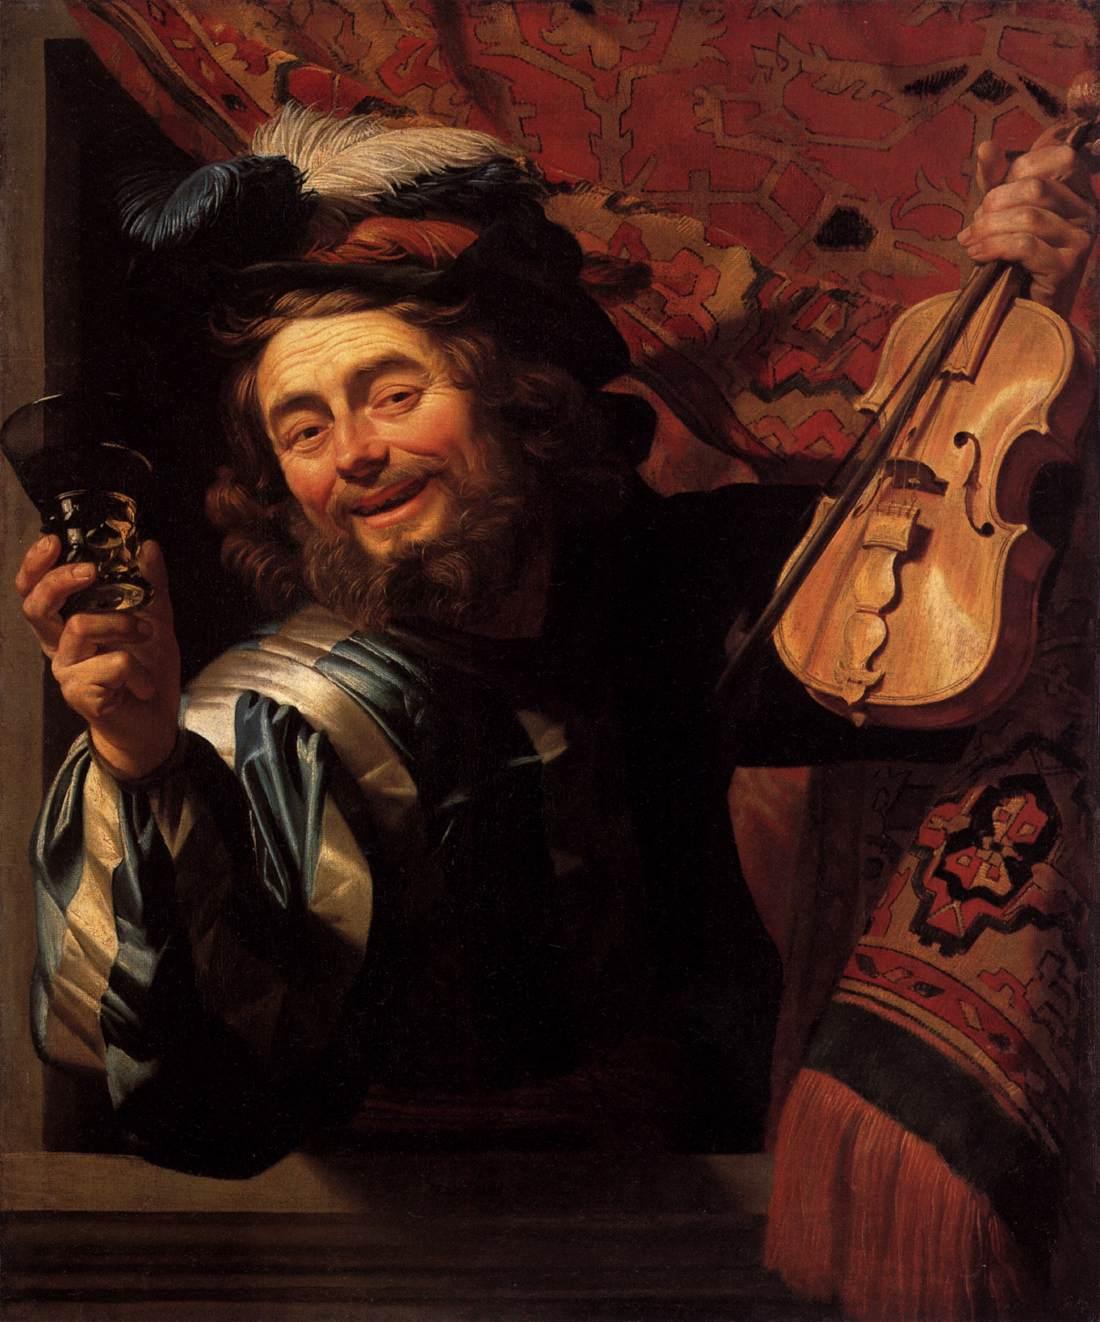 Gerrit van HONTHORST, The Merry Fiddler, 1623